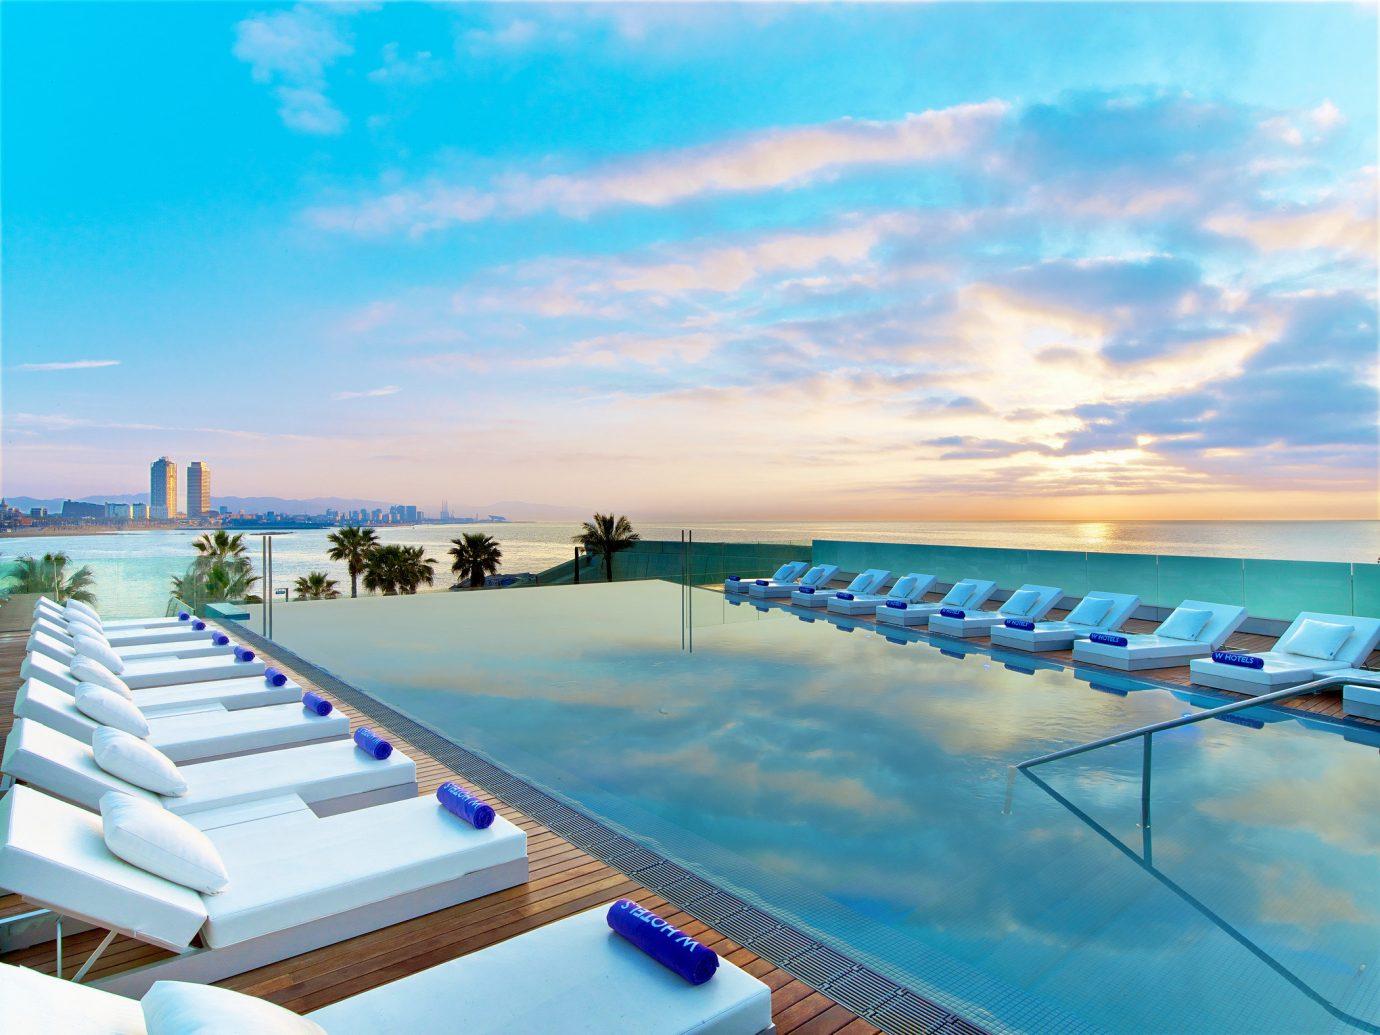 Hotels sky swimming pool leisure vacation caribbean Resort Ocean Sea row estate line lined